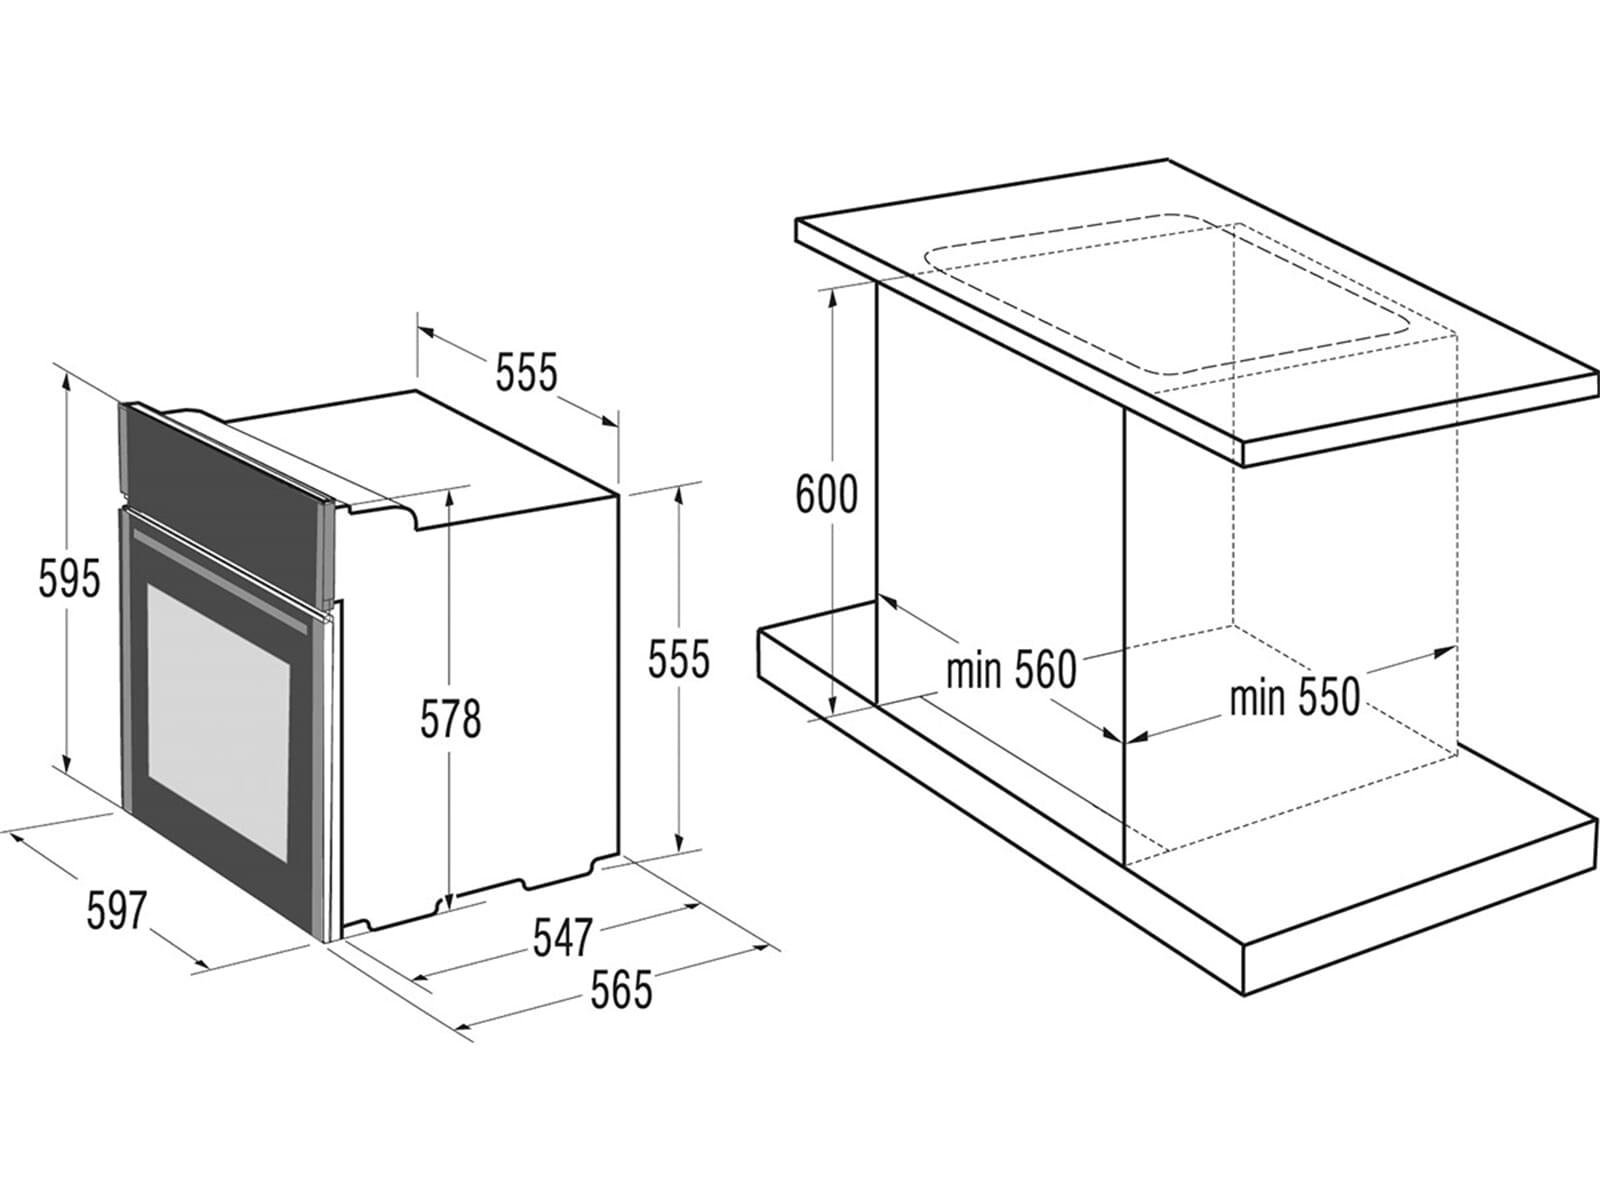 gorenje set herd bci 635 e19x 2 induktion glaskeramik kochfeld id 634 x ebay. Black Bedroom Furniture Sets. Home Design Ideas